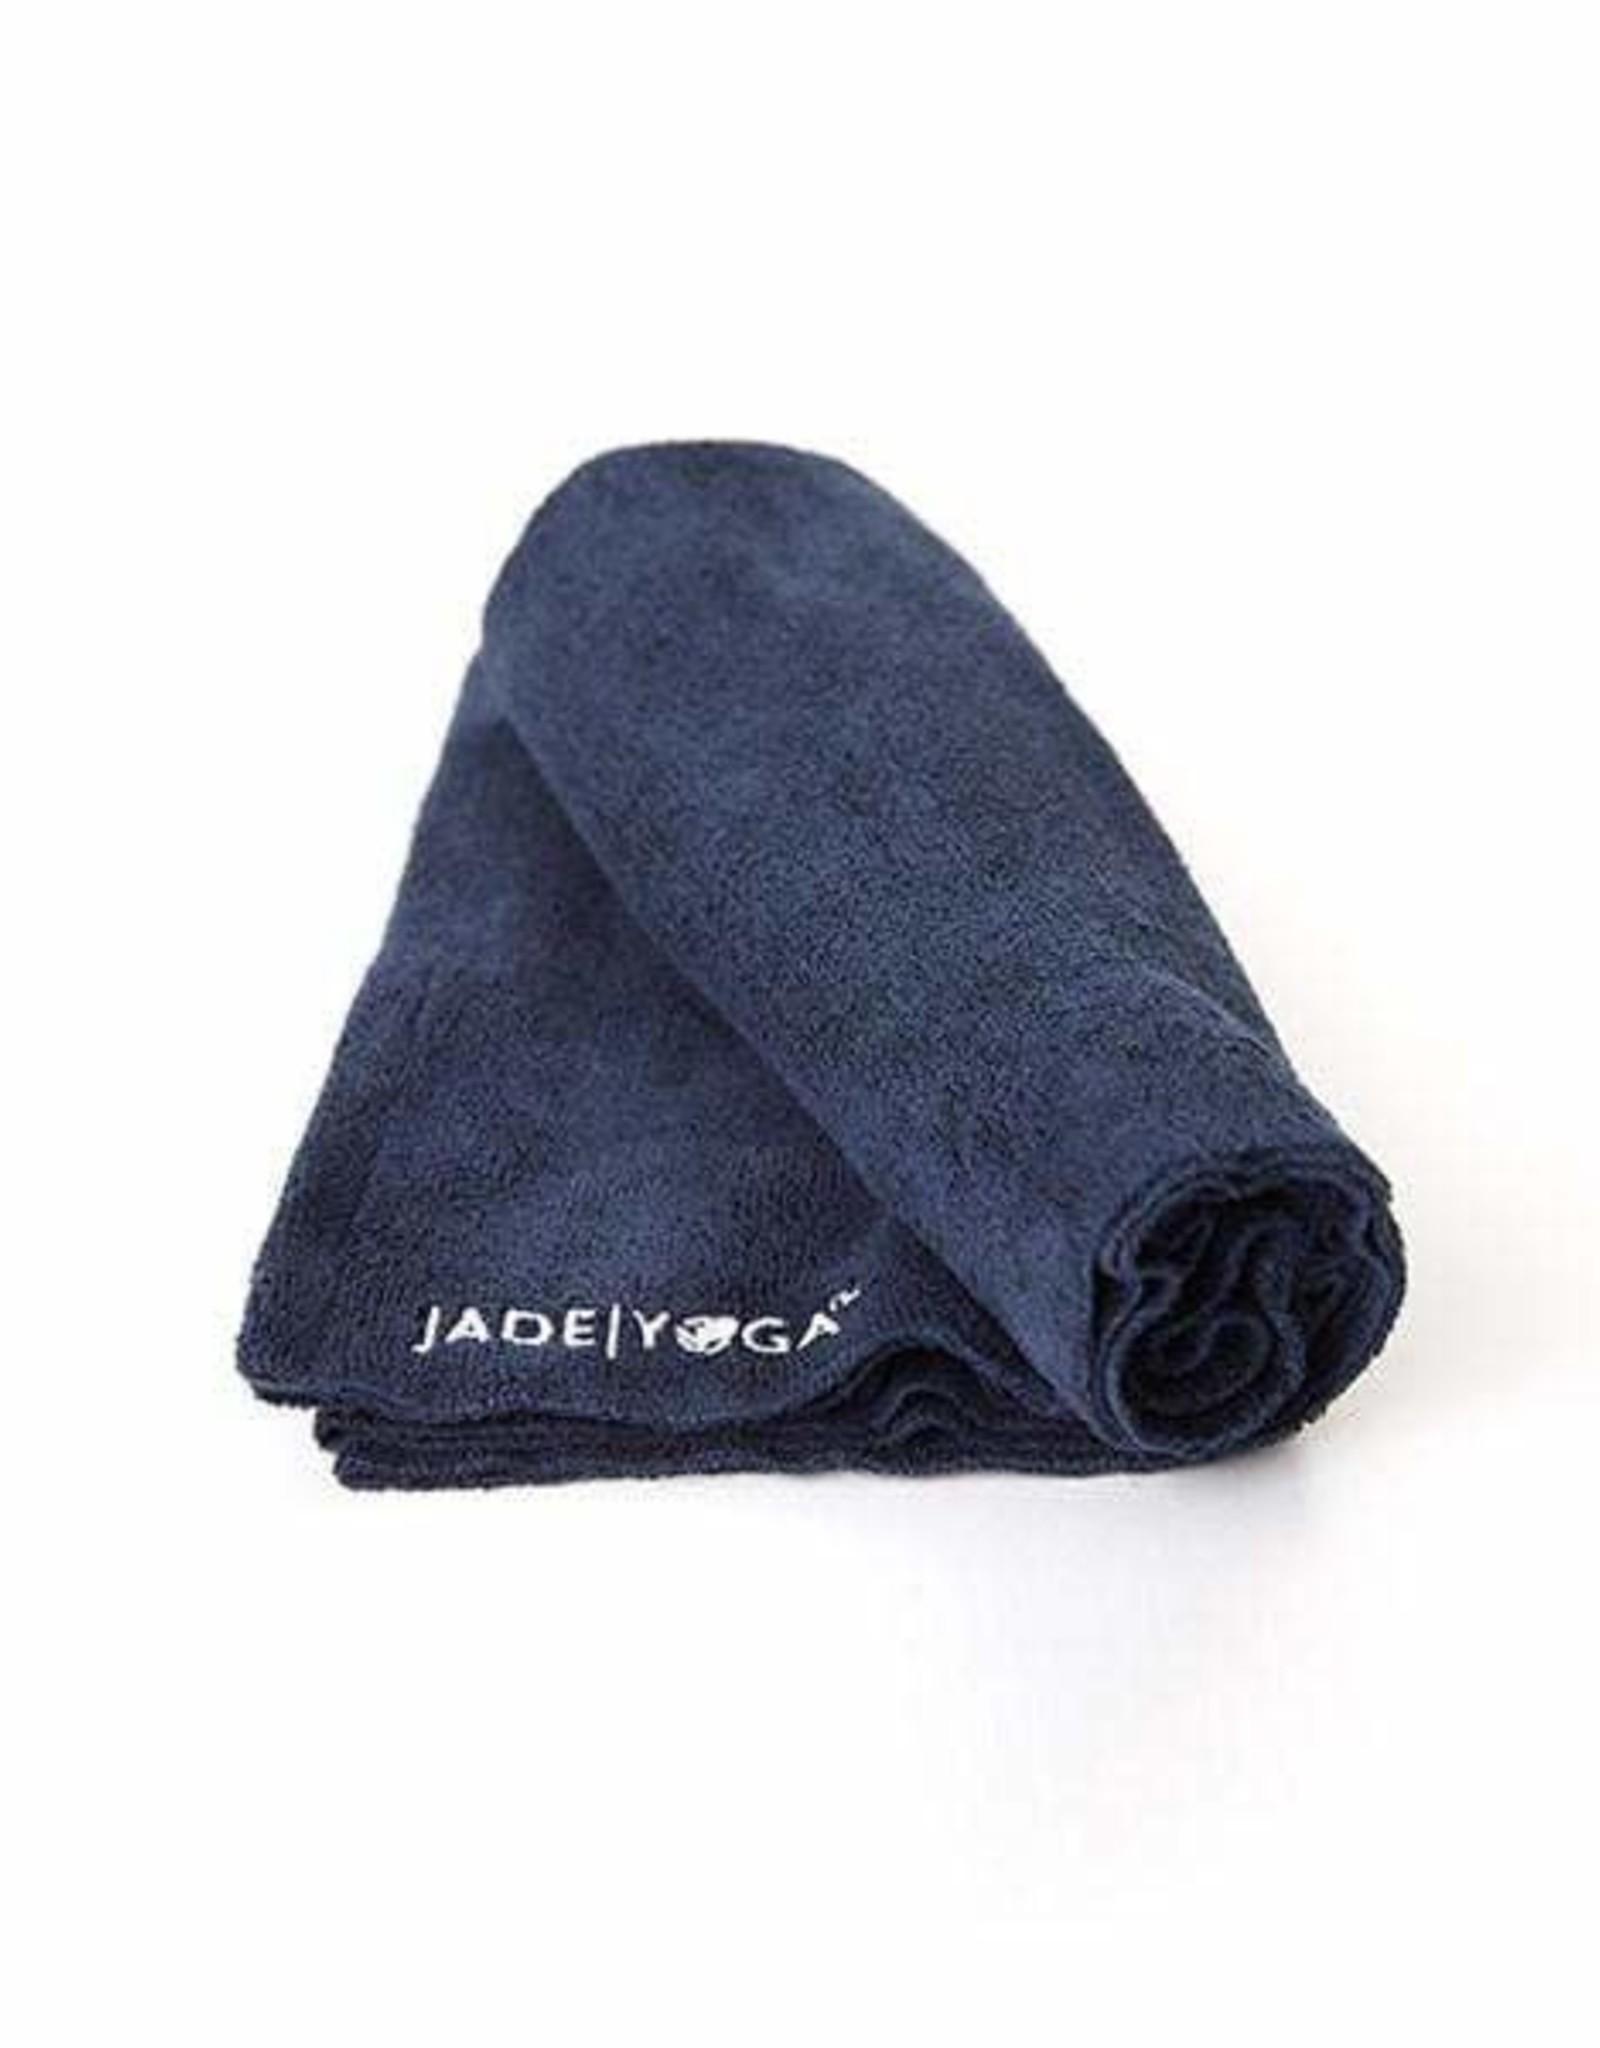 Jade Hand Towel